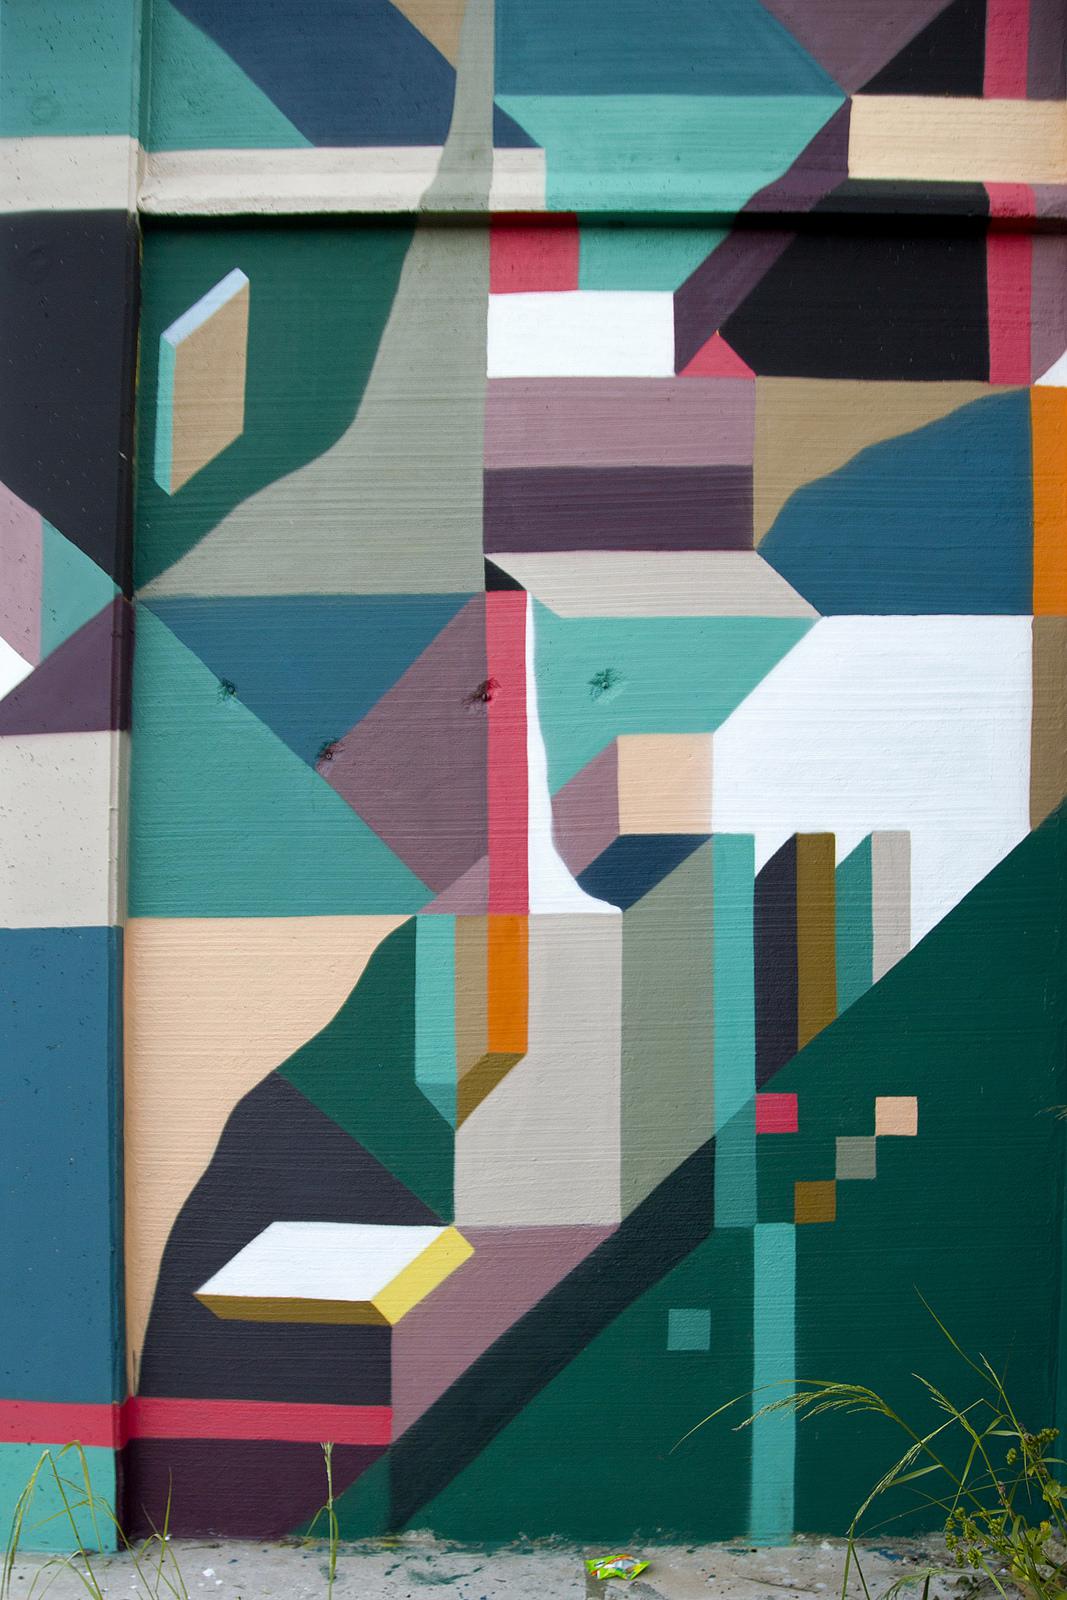 nelio-new-murals-for-memorie-urbane-festival-2014-05